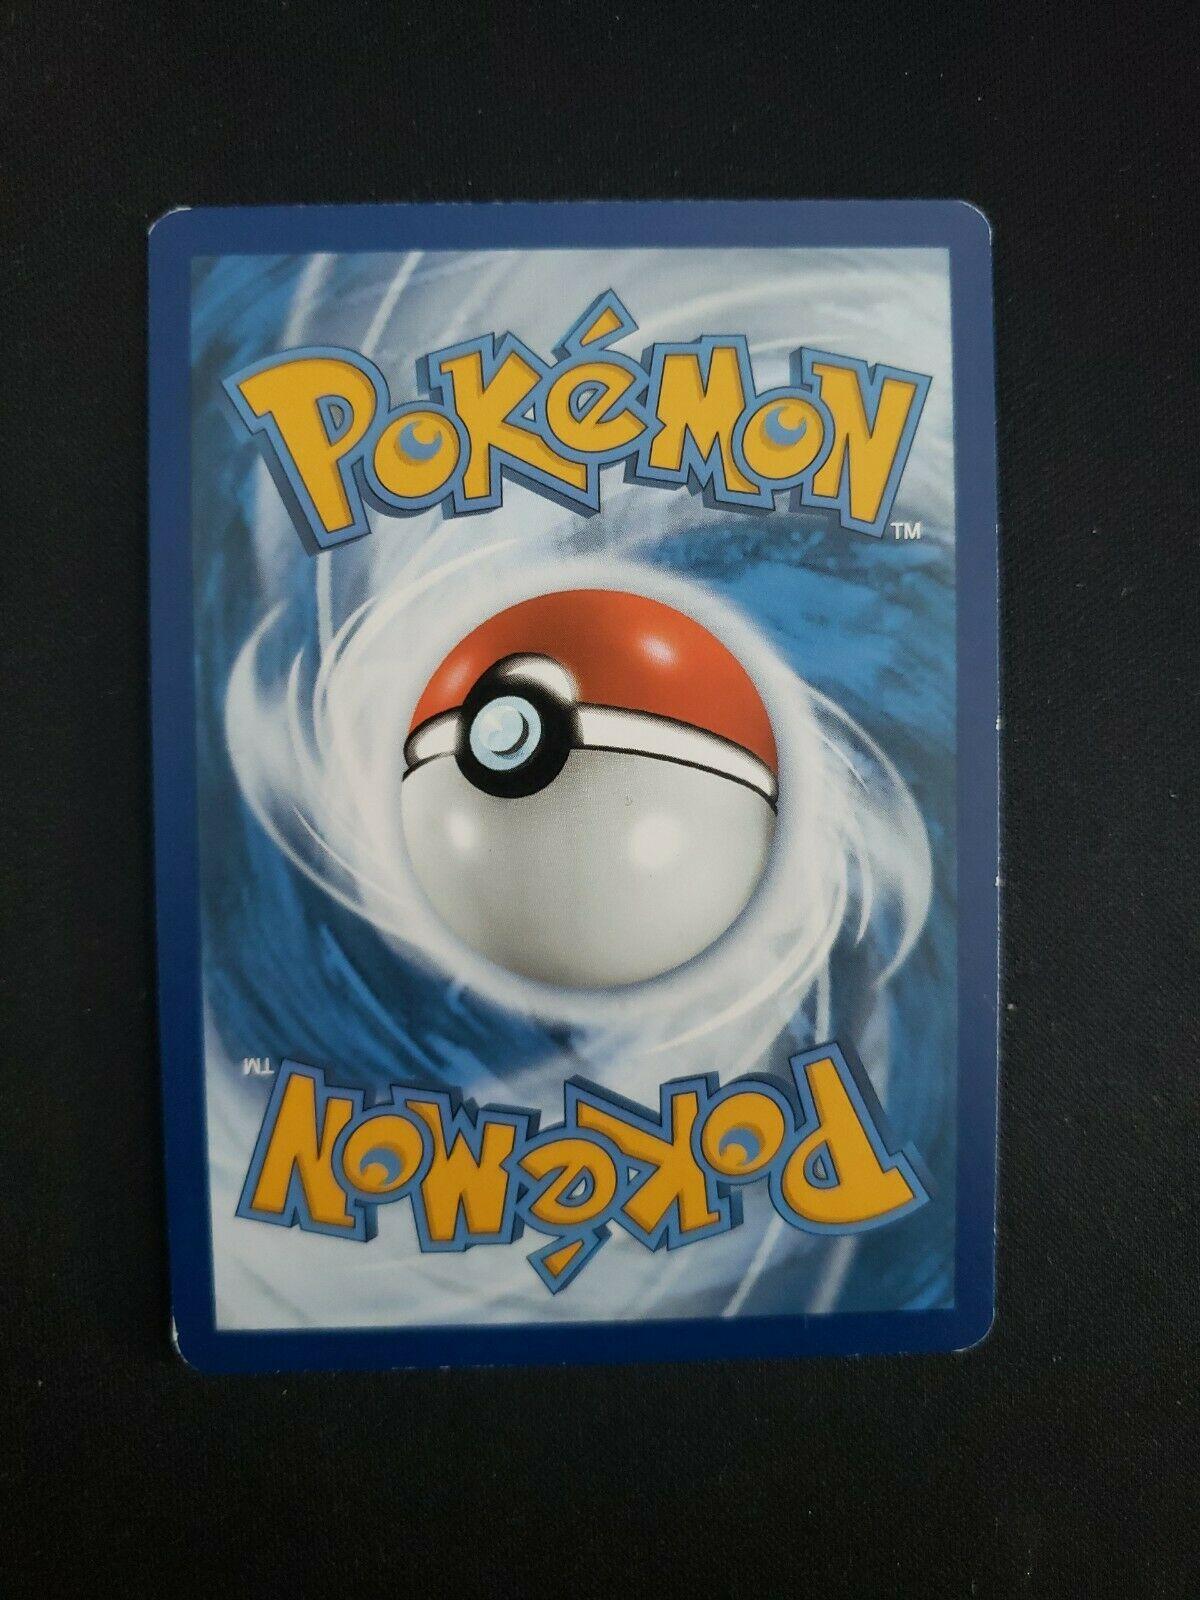 Pokemon Card Chilling Reign Honey - 142/198 - Uncommon Reverse Holo - Image 2